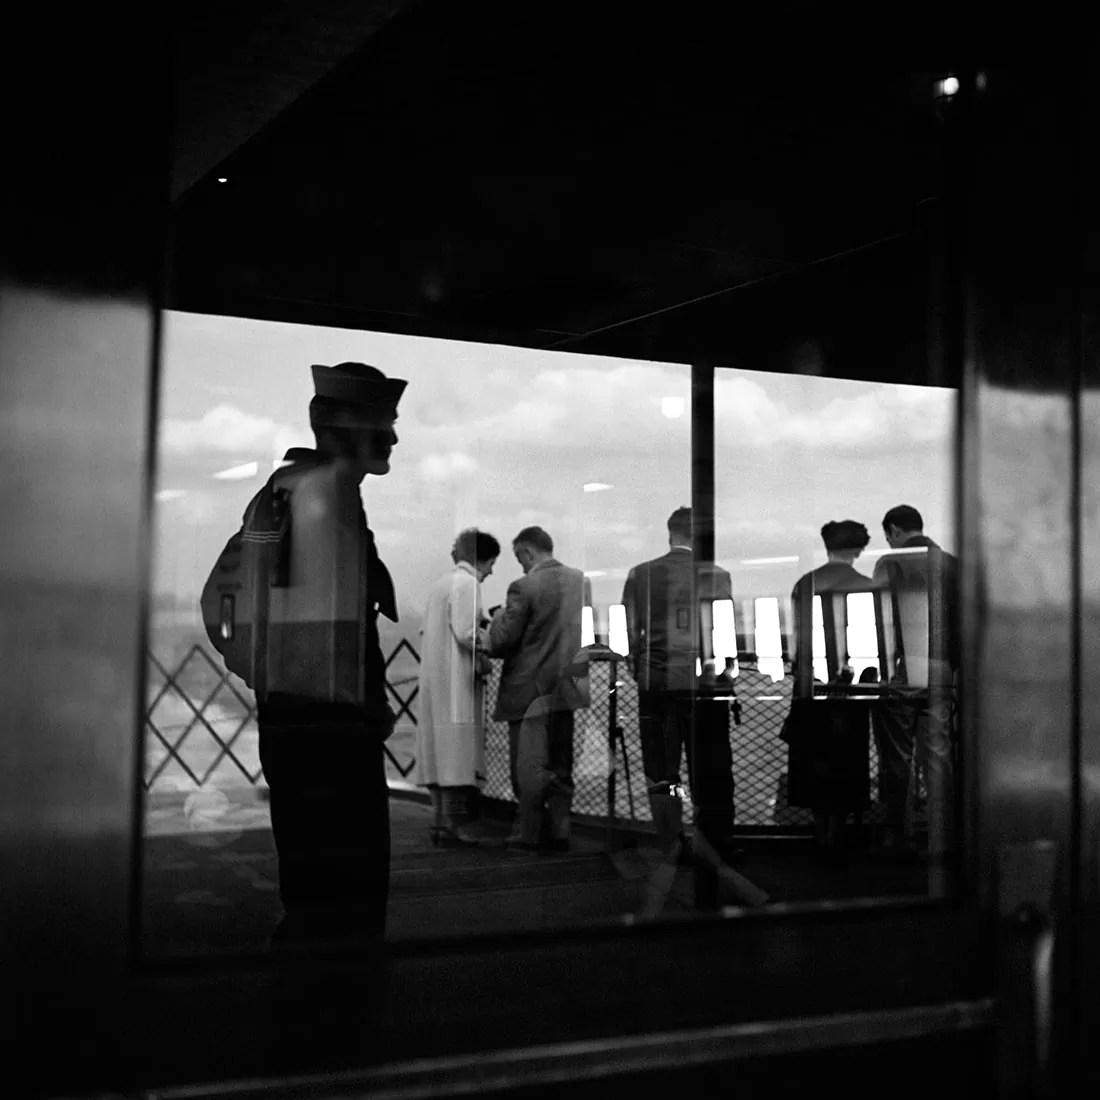 VM19XXW04202 03 MC - Una storia Meravigliosa: Vivian Maier (Street Photography) - fotostreet.it